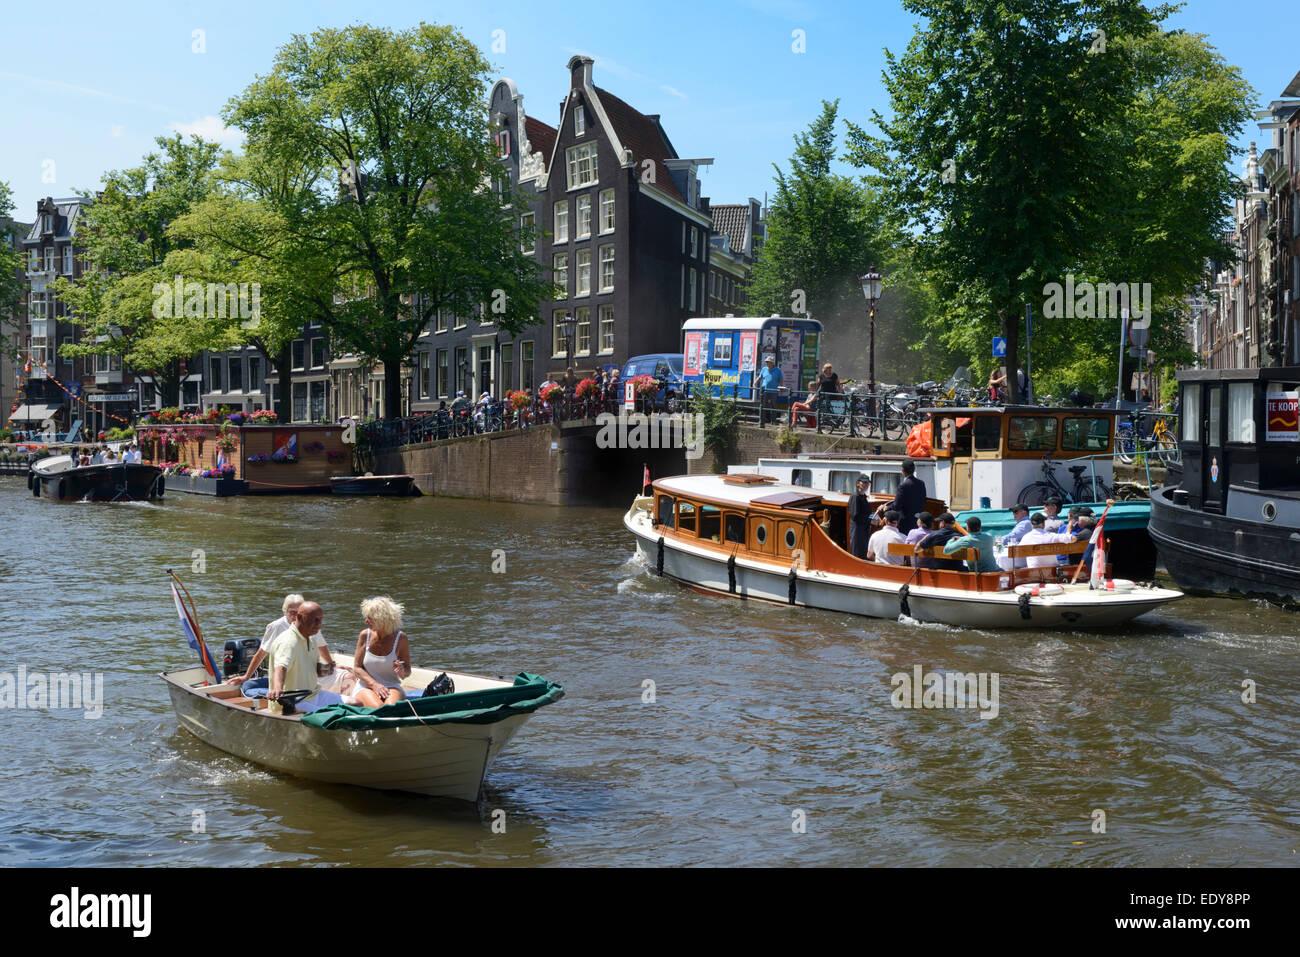 Pleasure boats, Prinsengracht, Amsterdam, North Holland, Netherlands, Europe - Stock Image